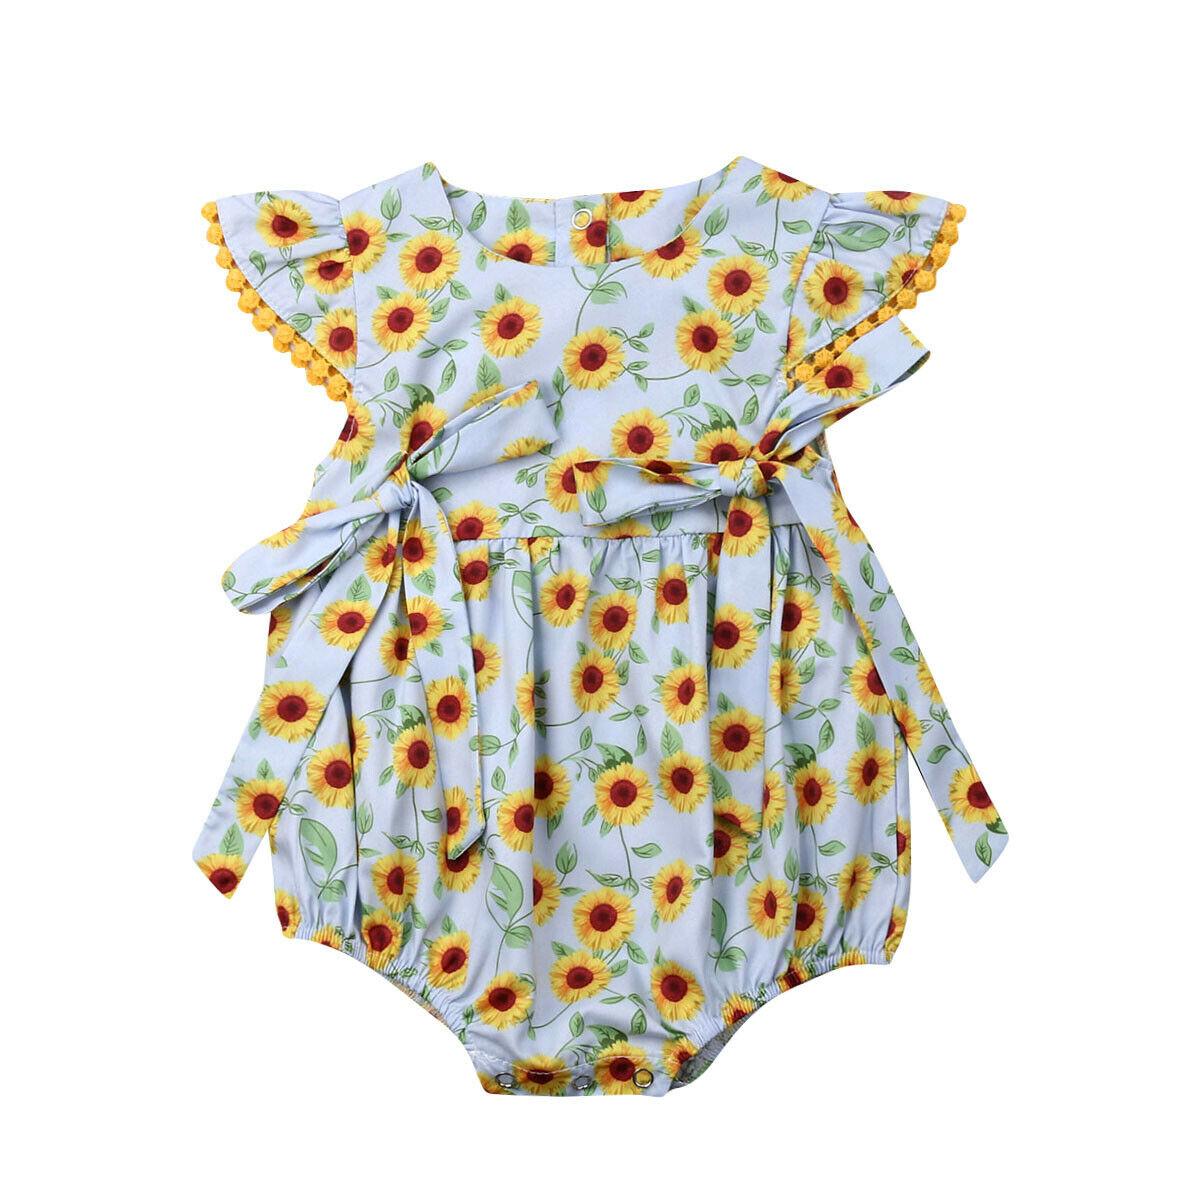 Newborn Infant Baby Girls Floral Bow Romper Jumpsuit Bodysuit Outfits Clothes